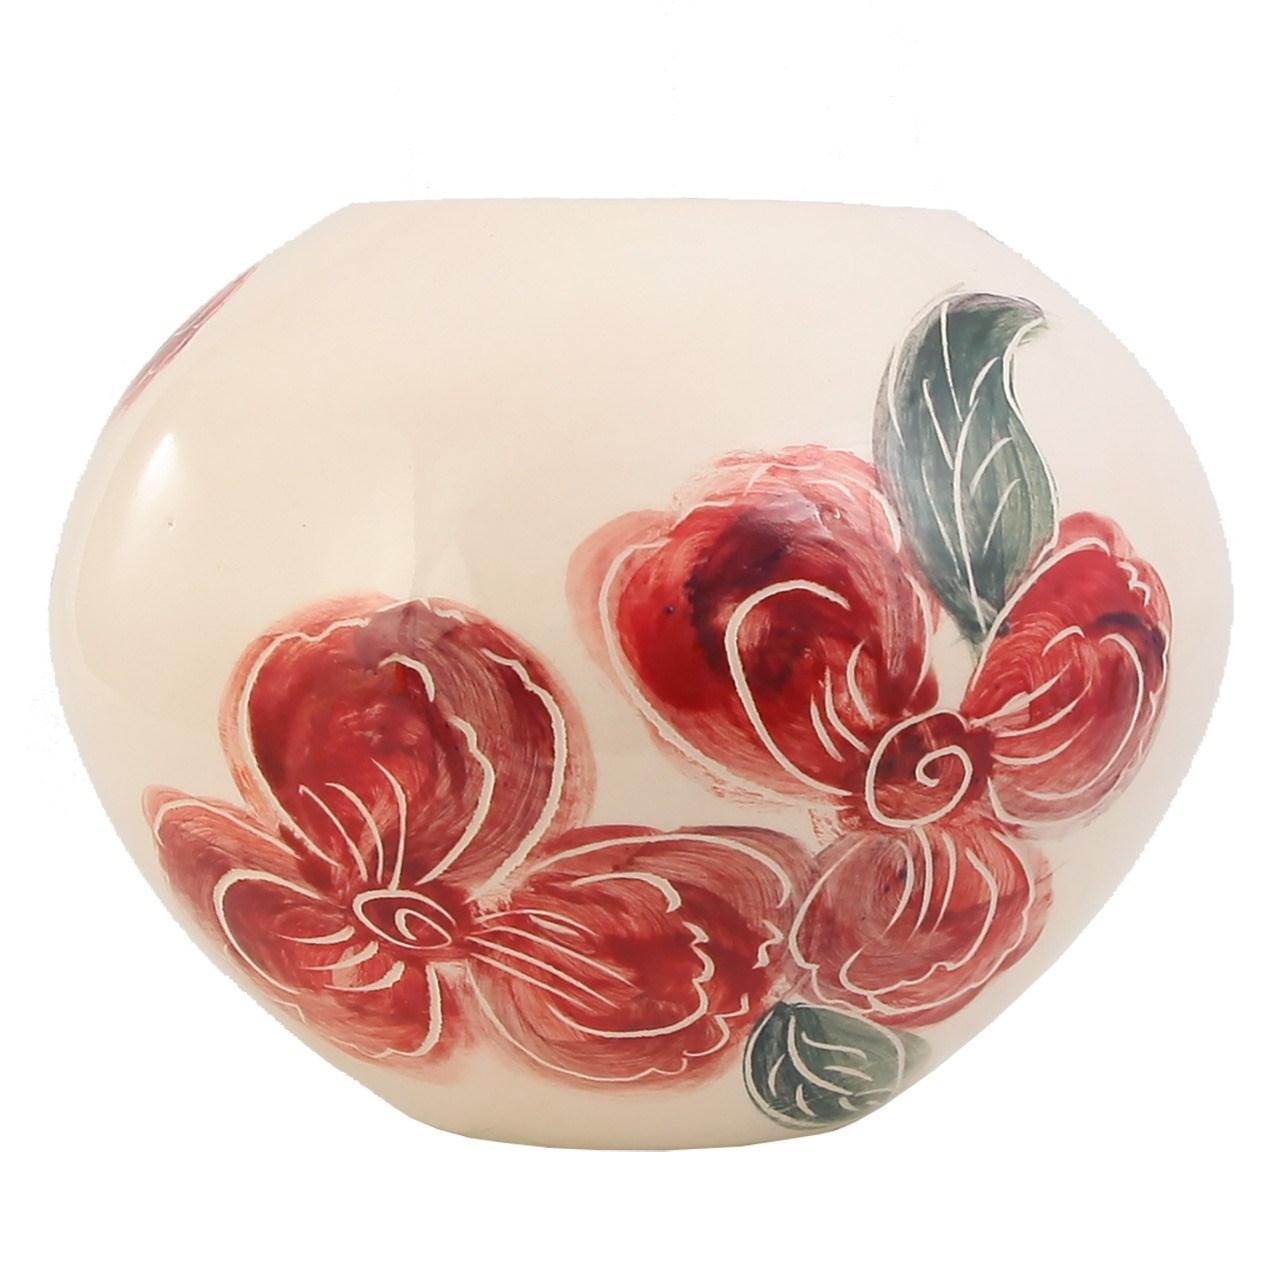 گلدان سرامیکی گالری فرتاش طرح گل صورتی کد171031